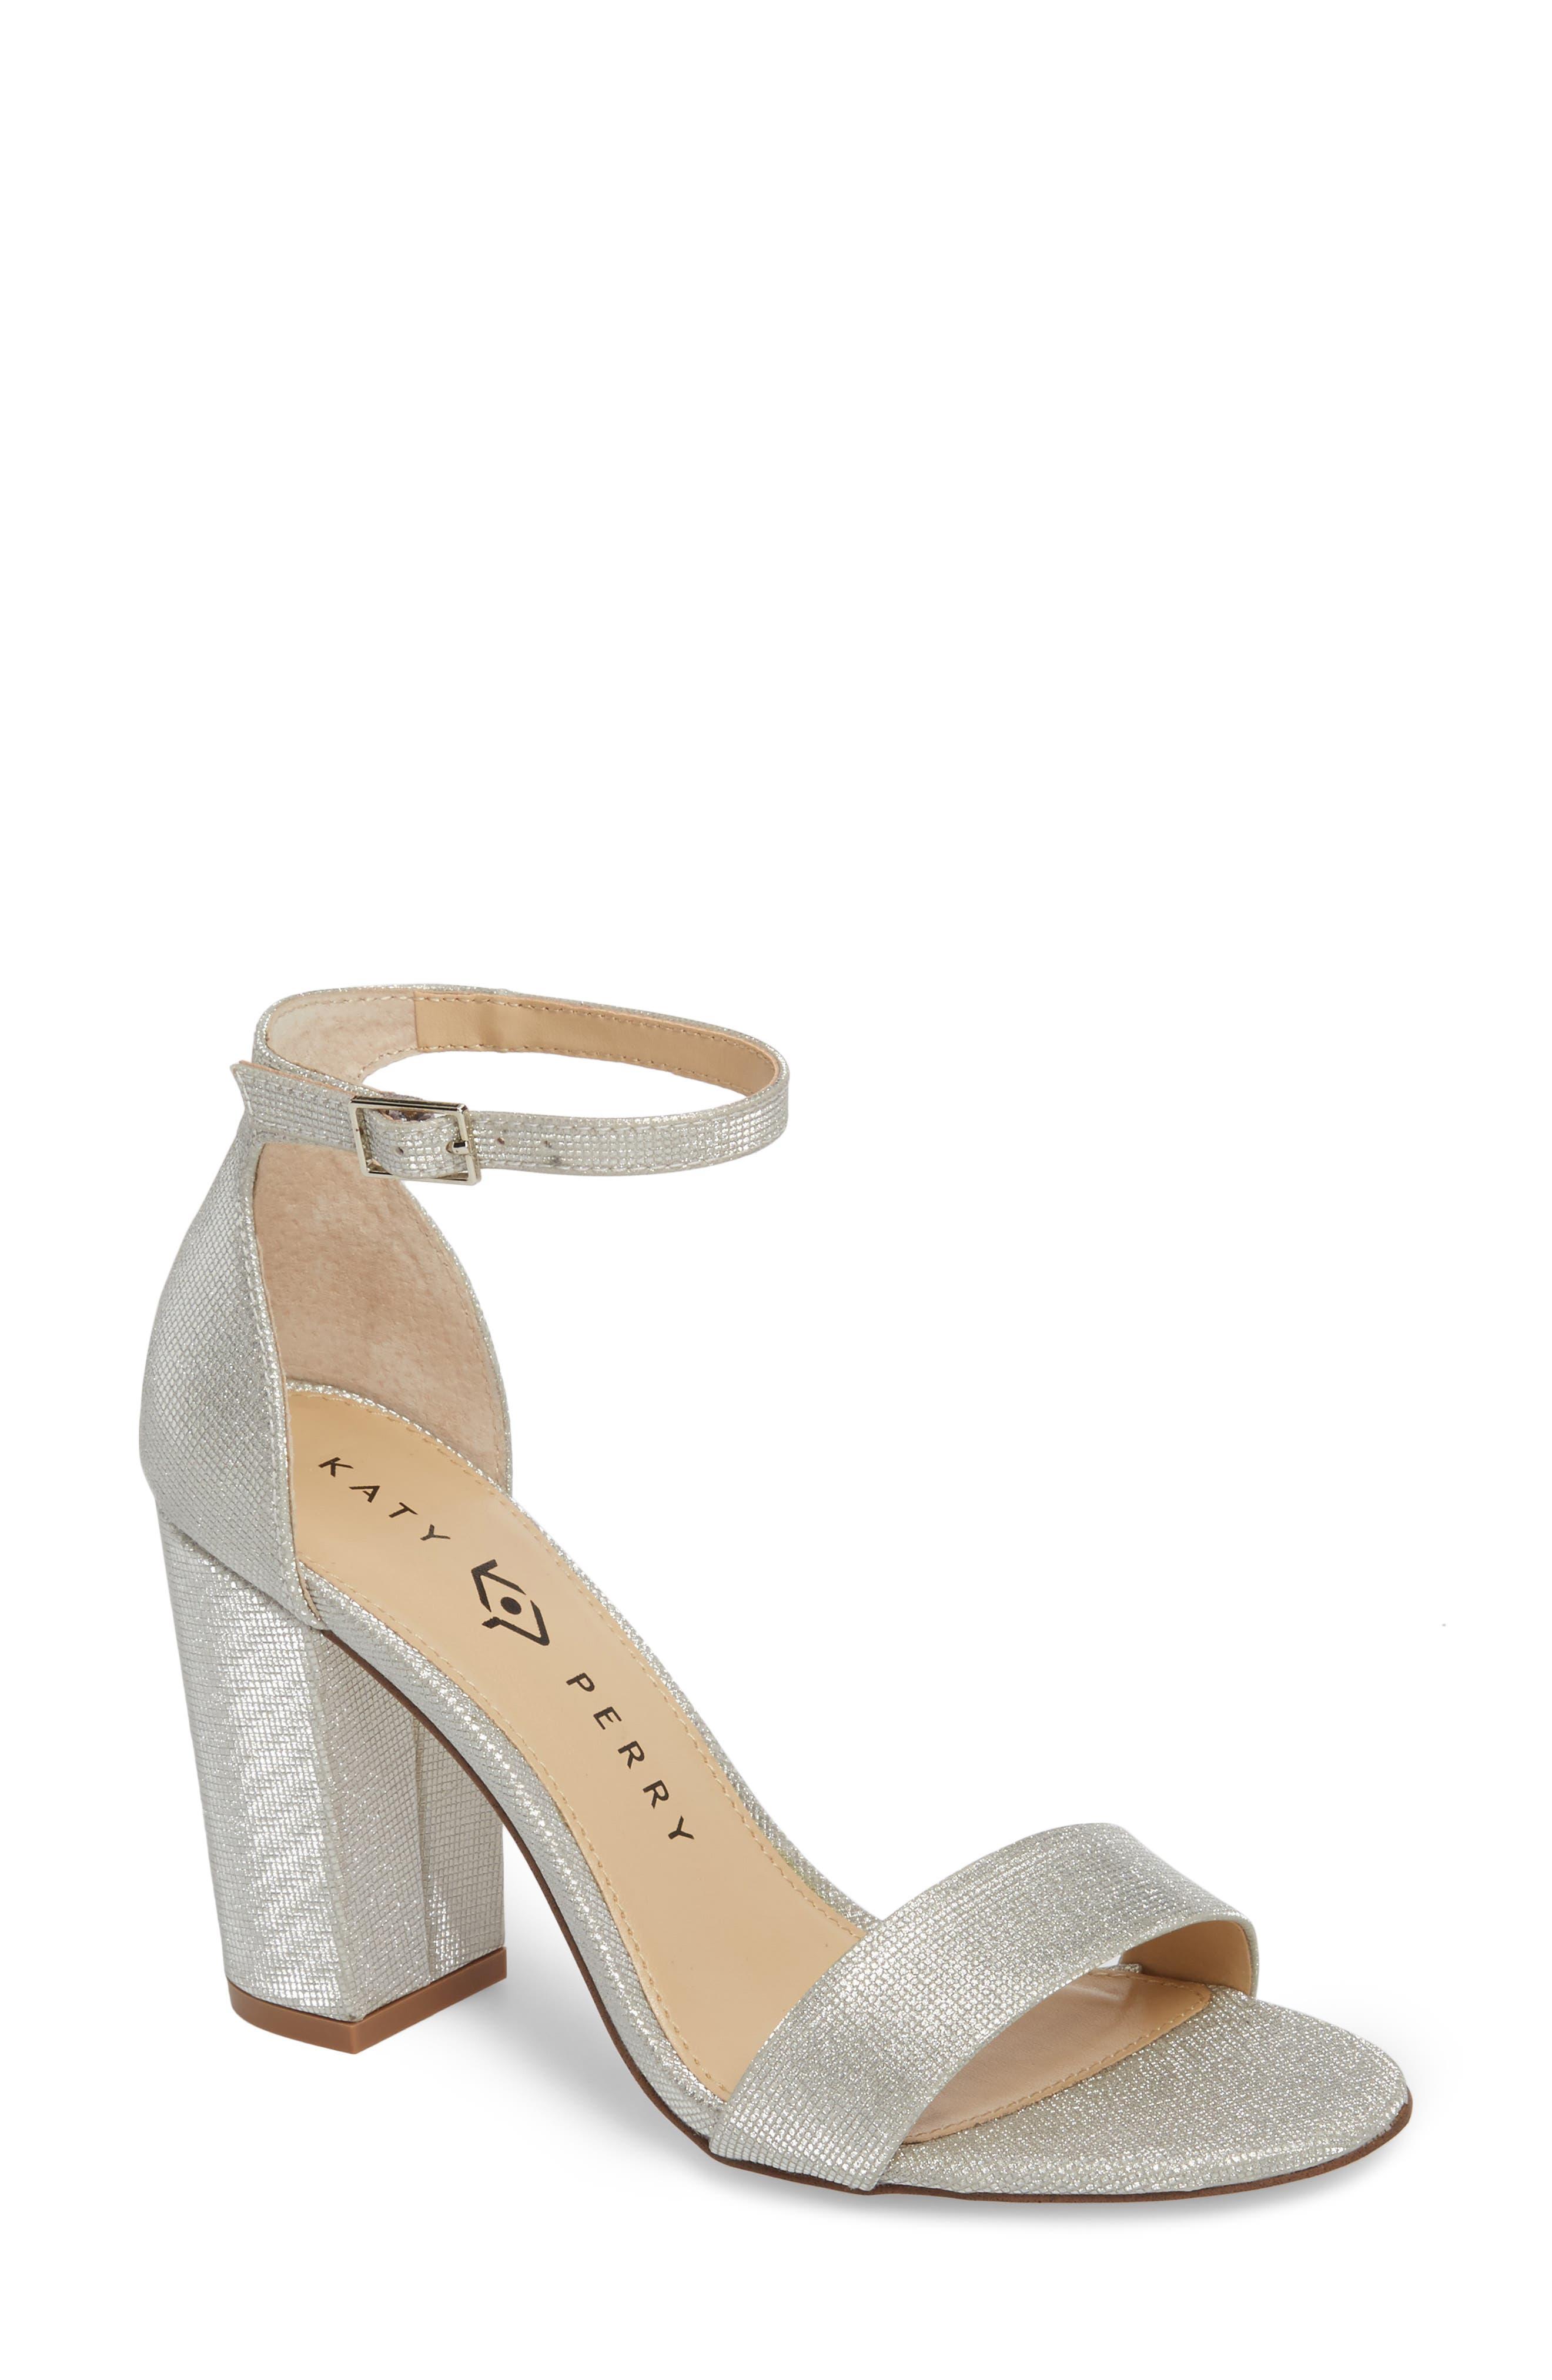 Ankle Strap Sandal,                         Main,                         color,